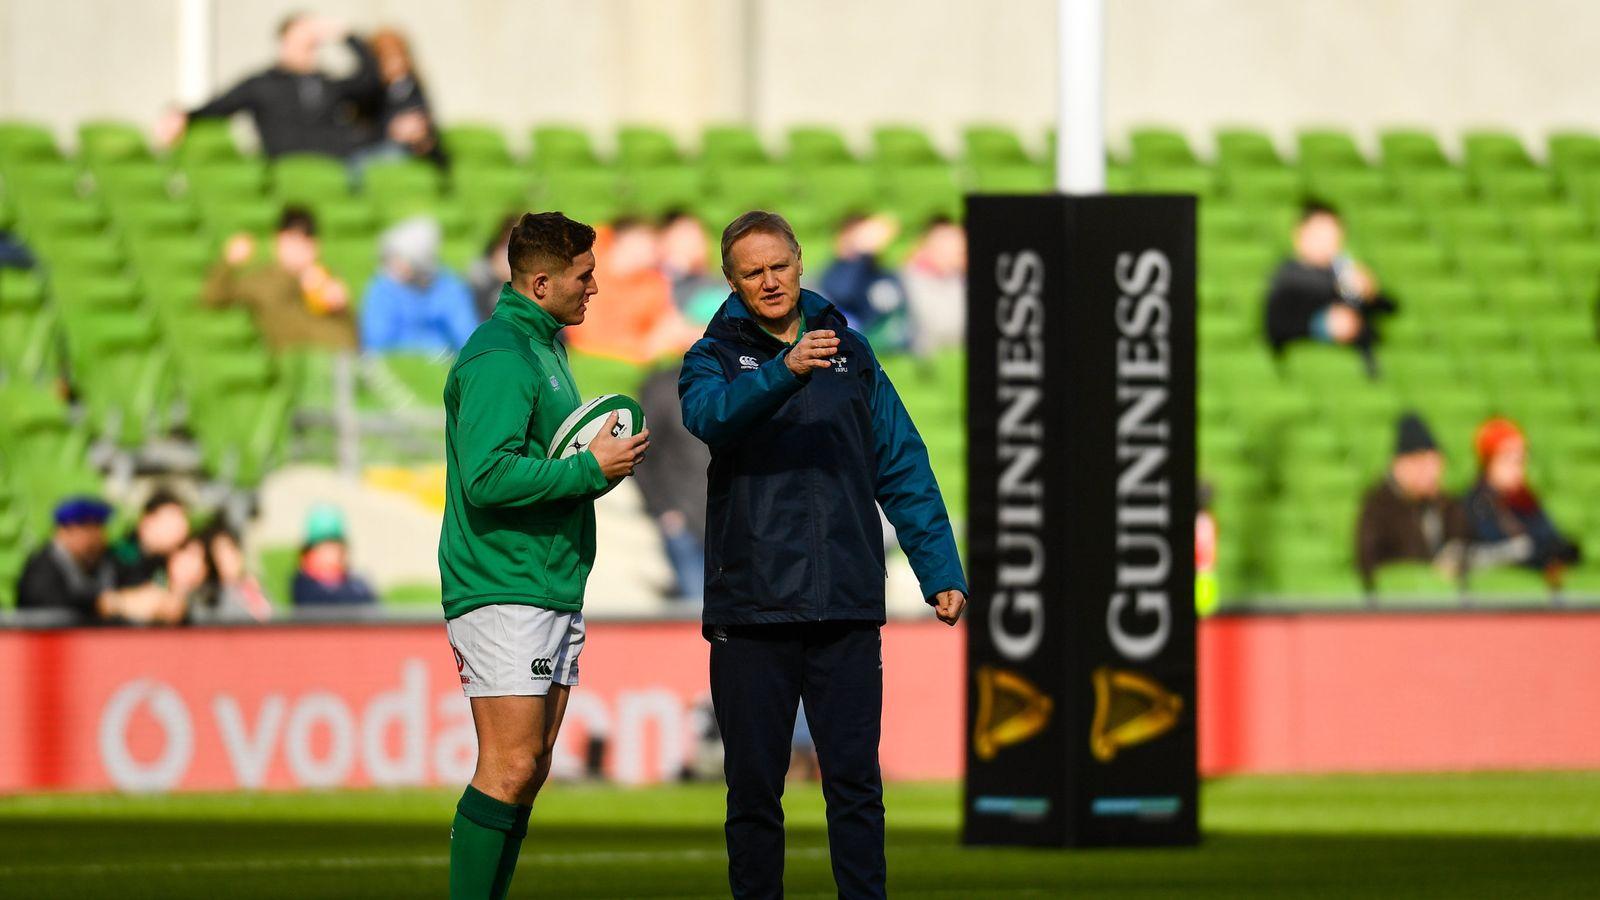 Joe Schmidt Says Ireland's Win Against France Has Put Them